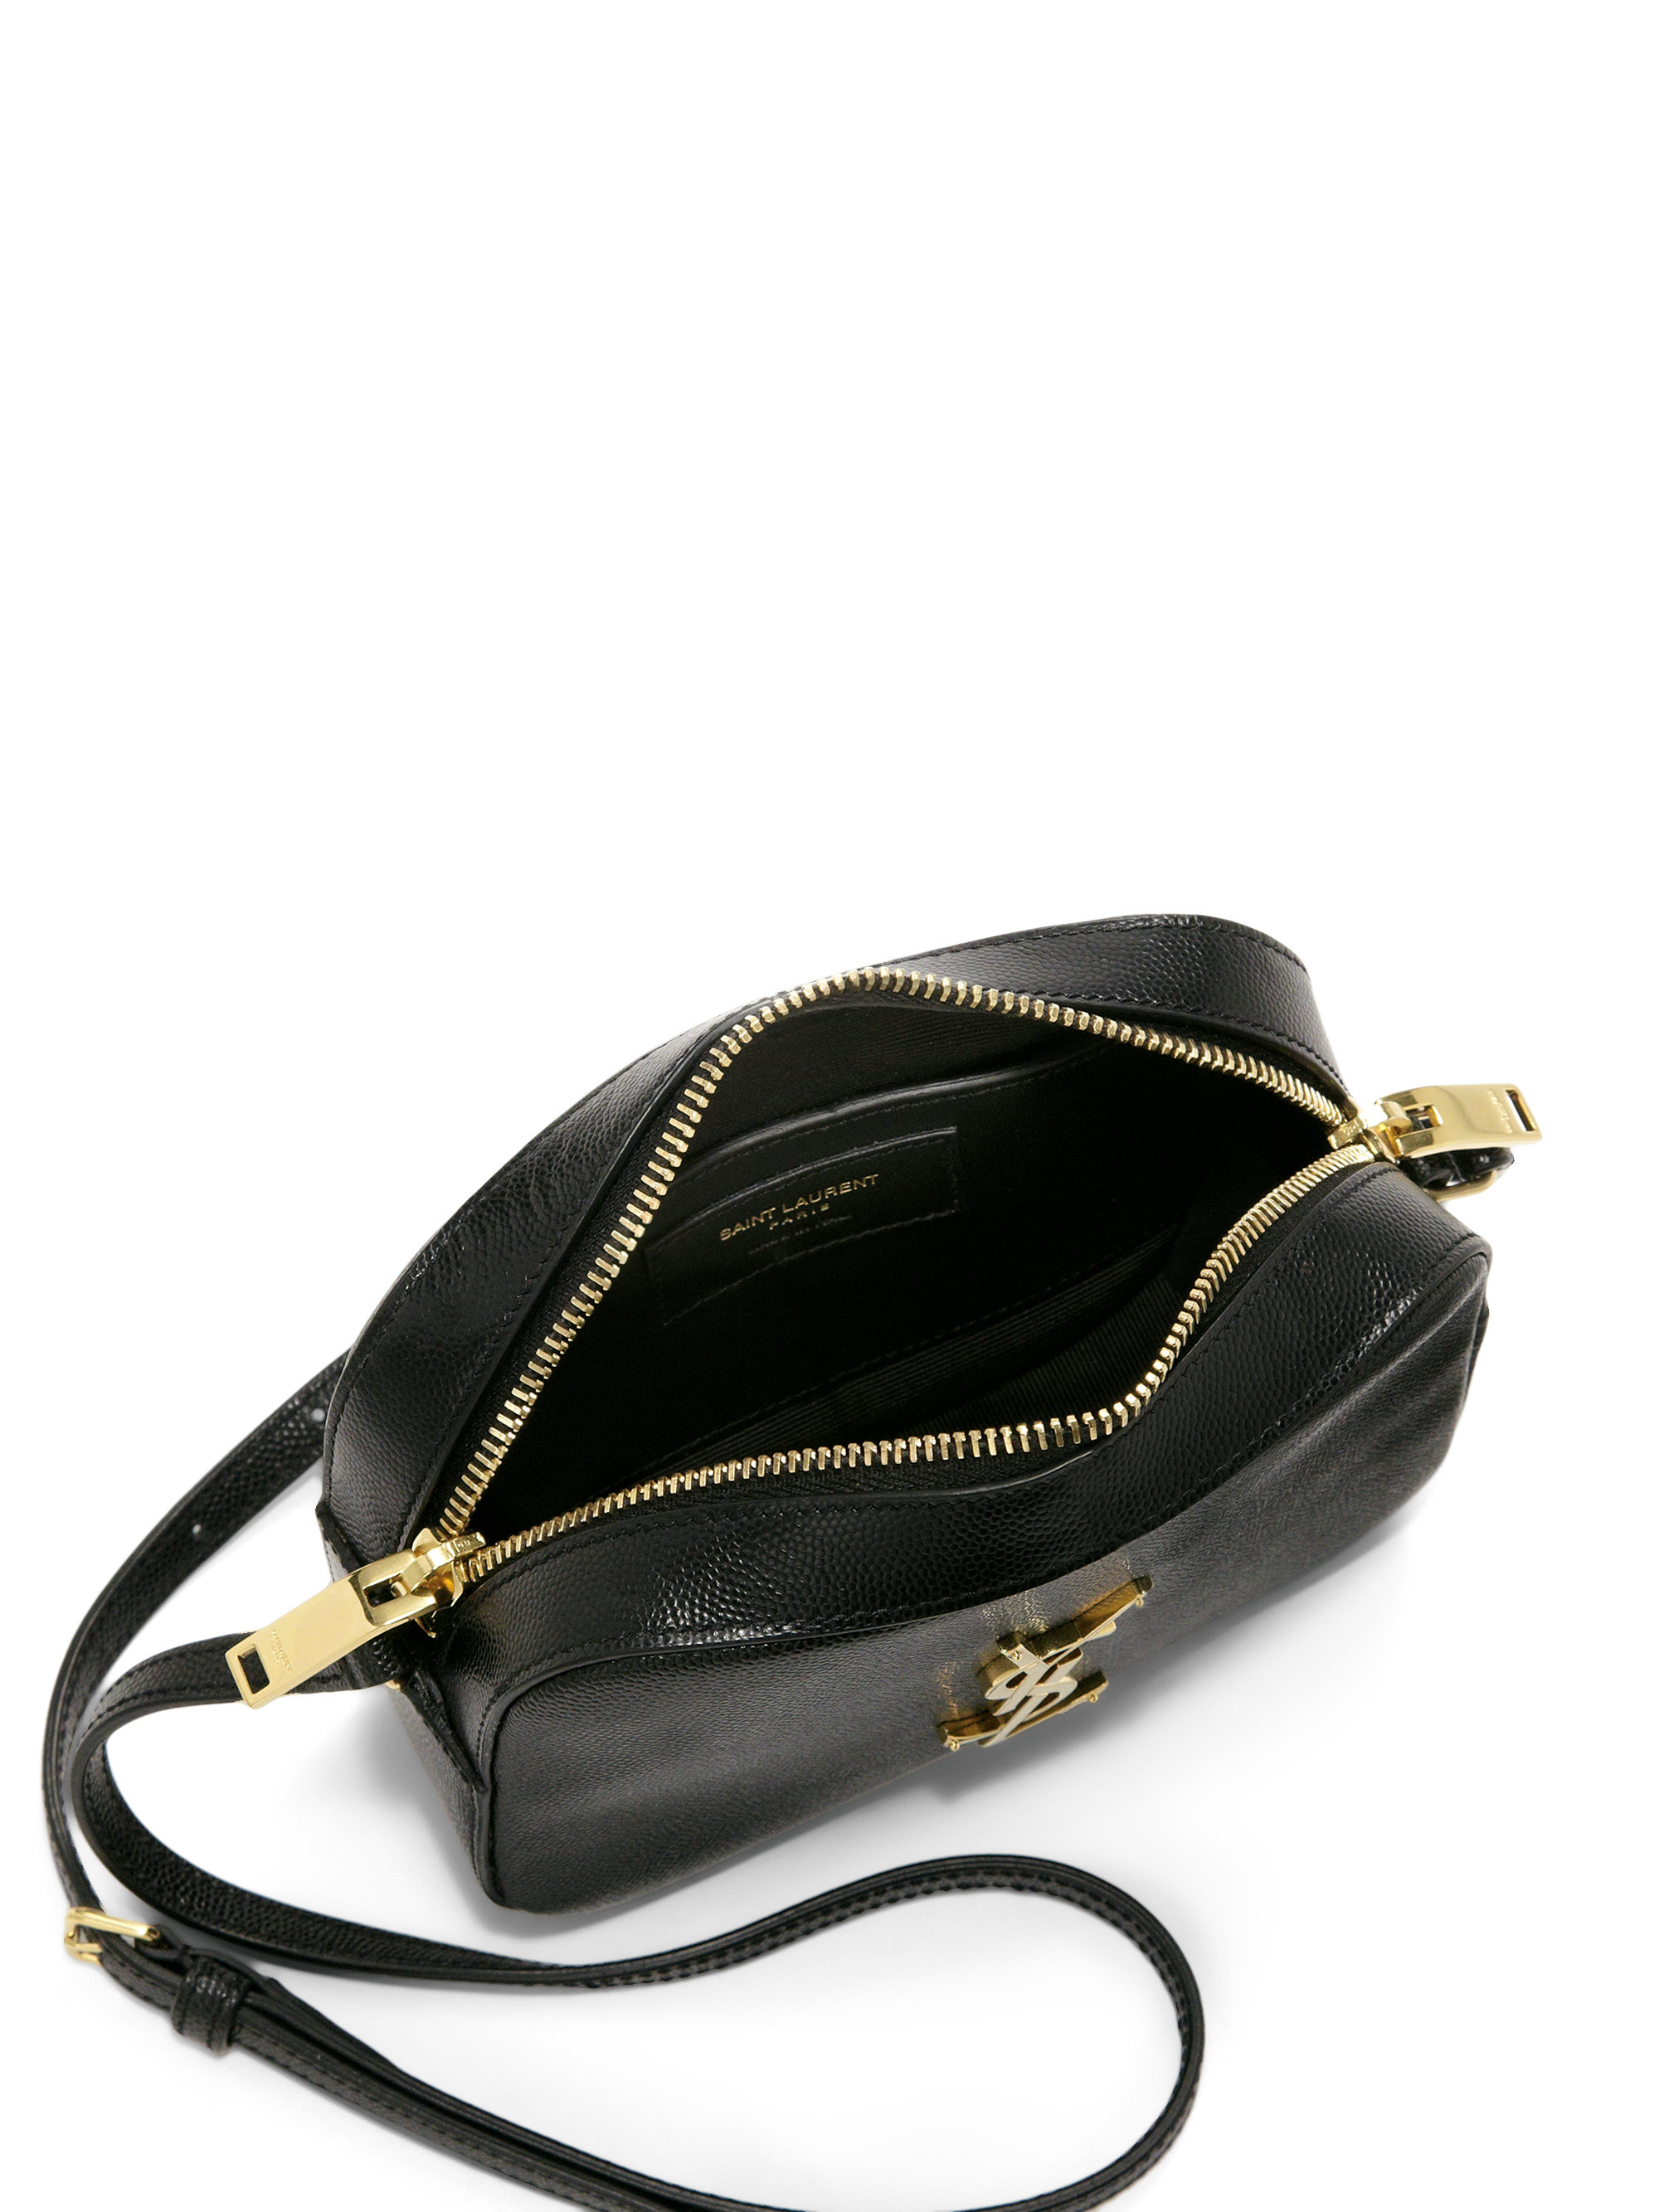 c664f35b6f Lyst - Saint Laurent Monogram Small Textured Leather Camera Bag in Black